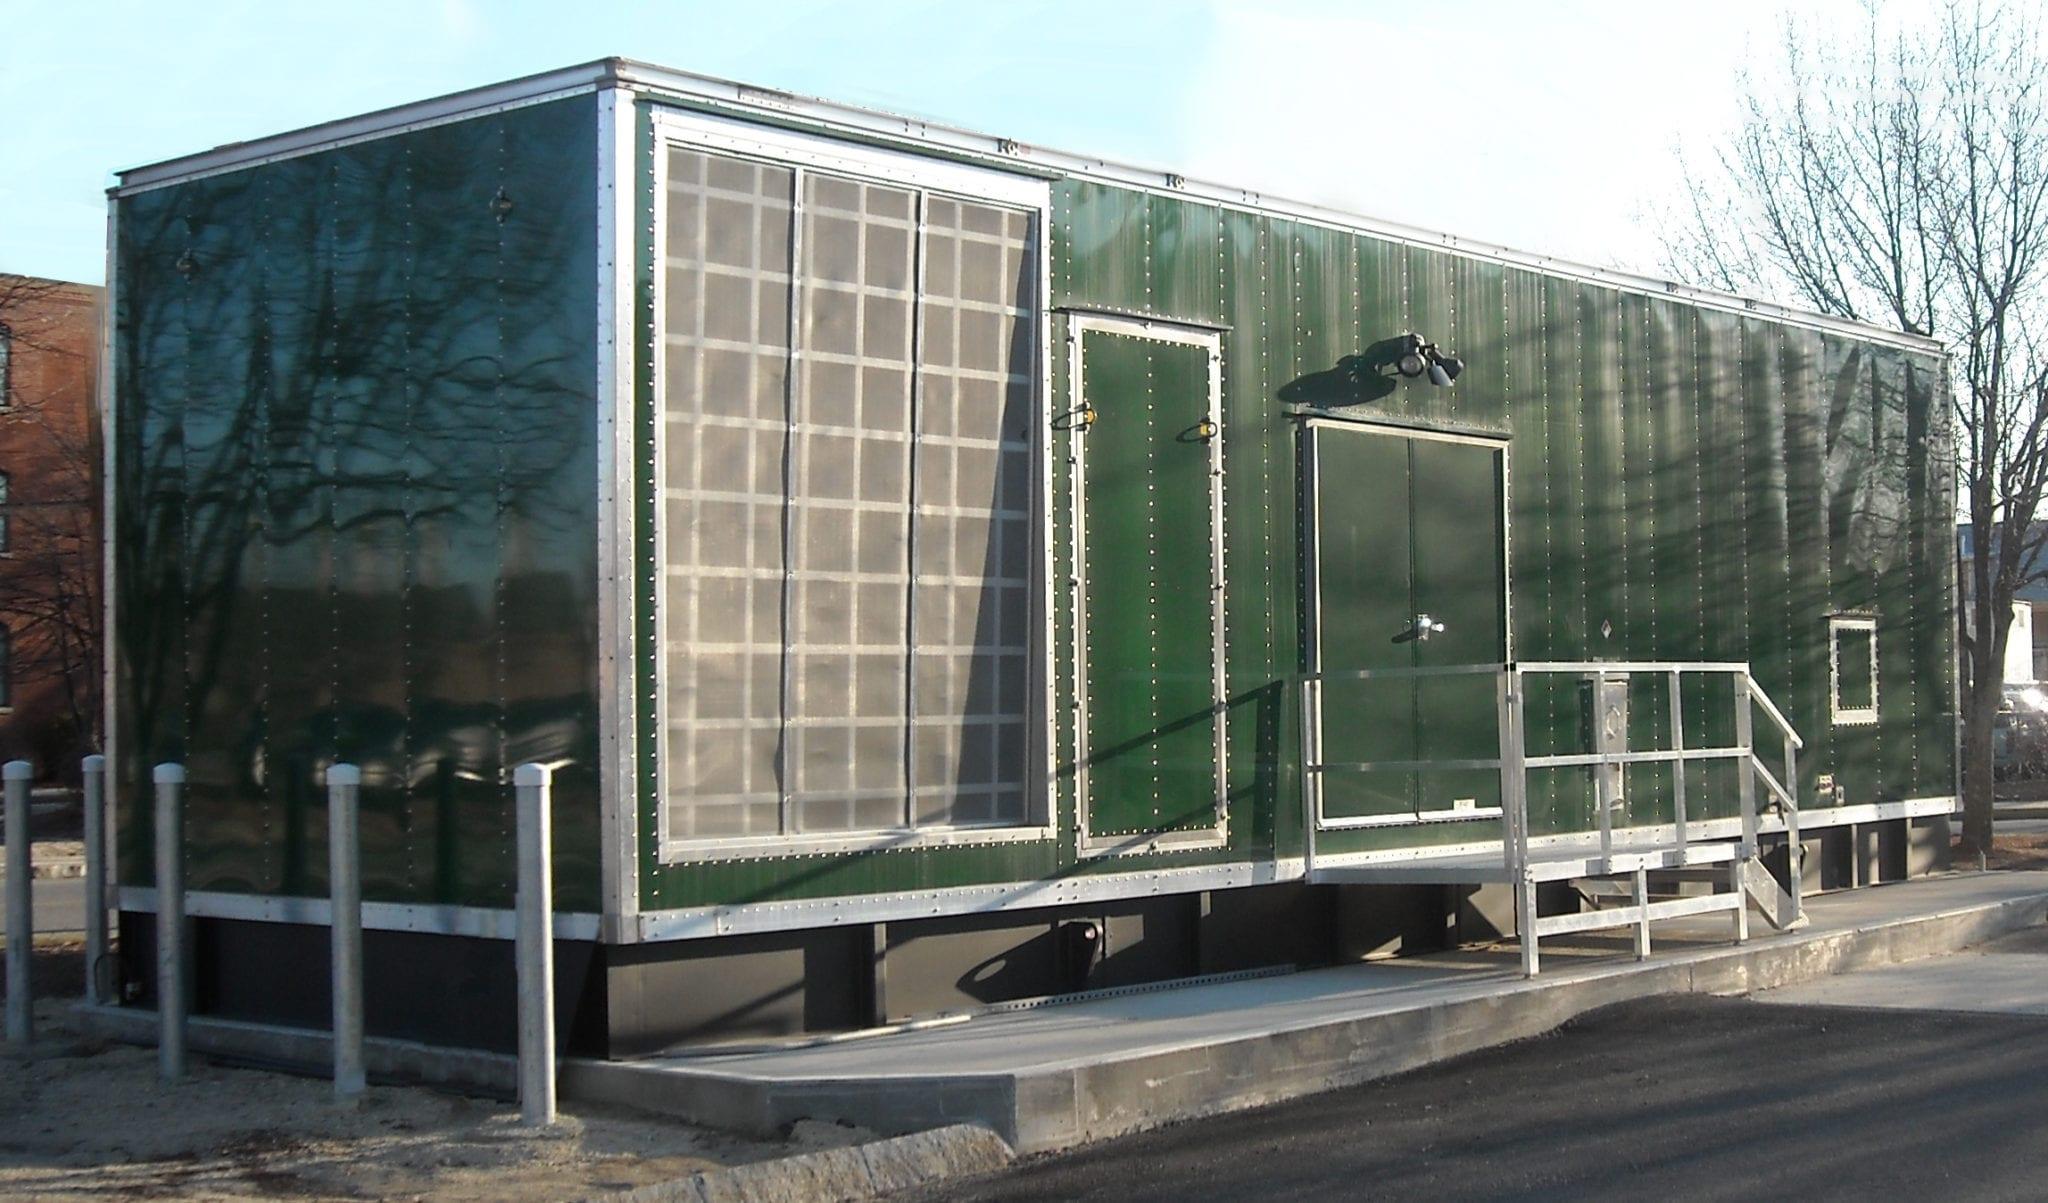 gate-city-electric-generator-system-design-installation-nh-2meg